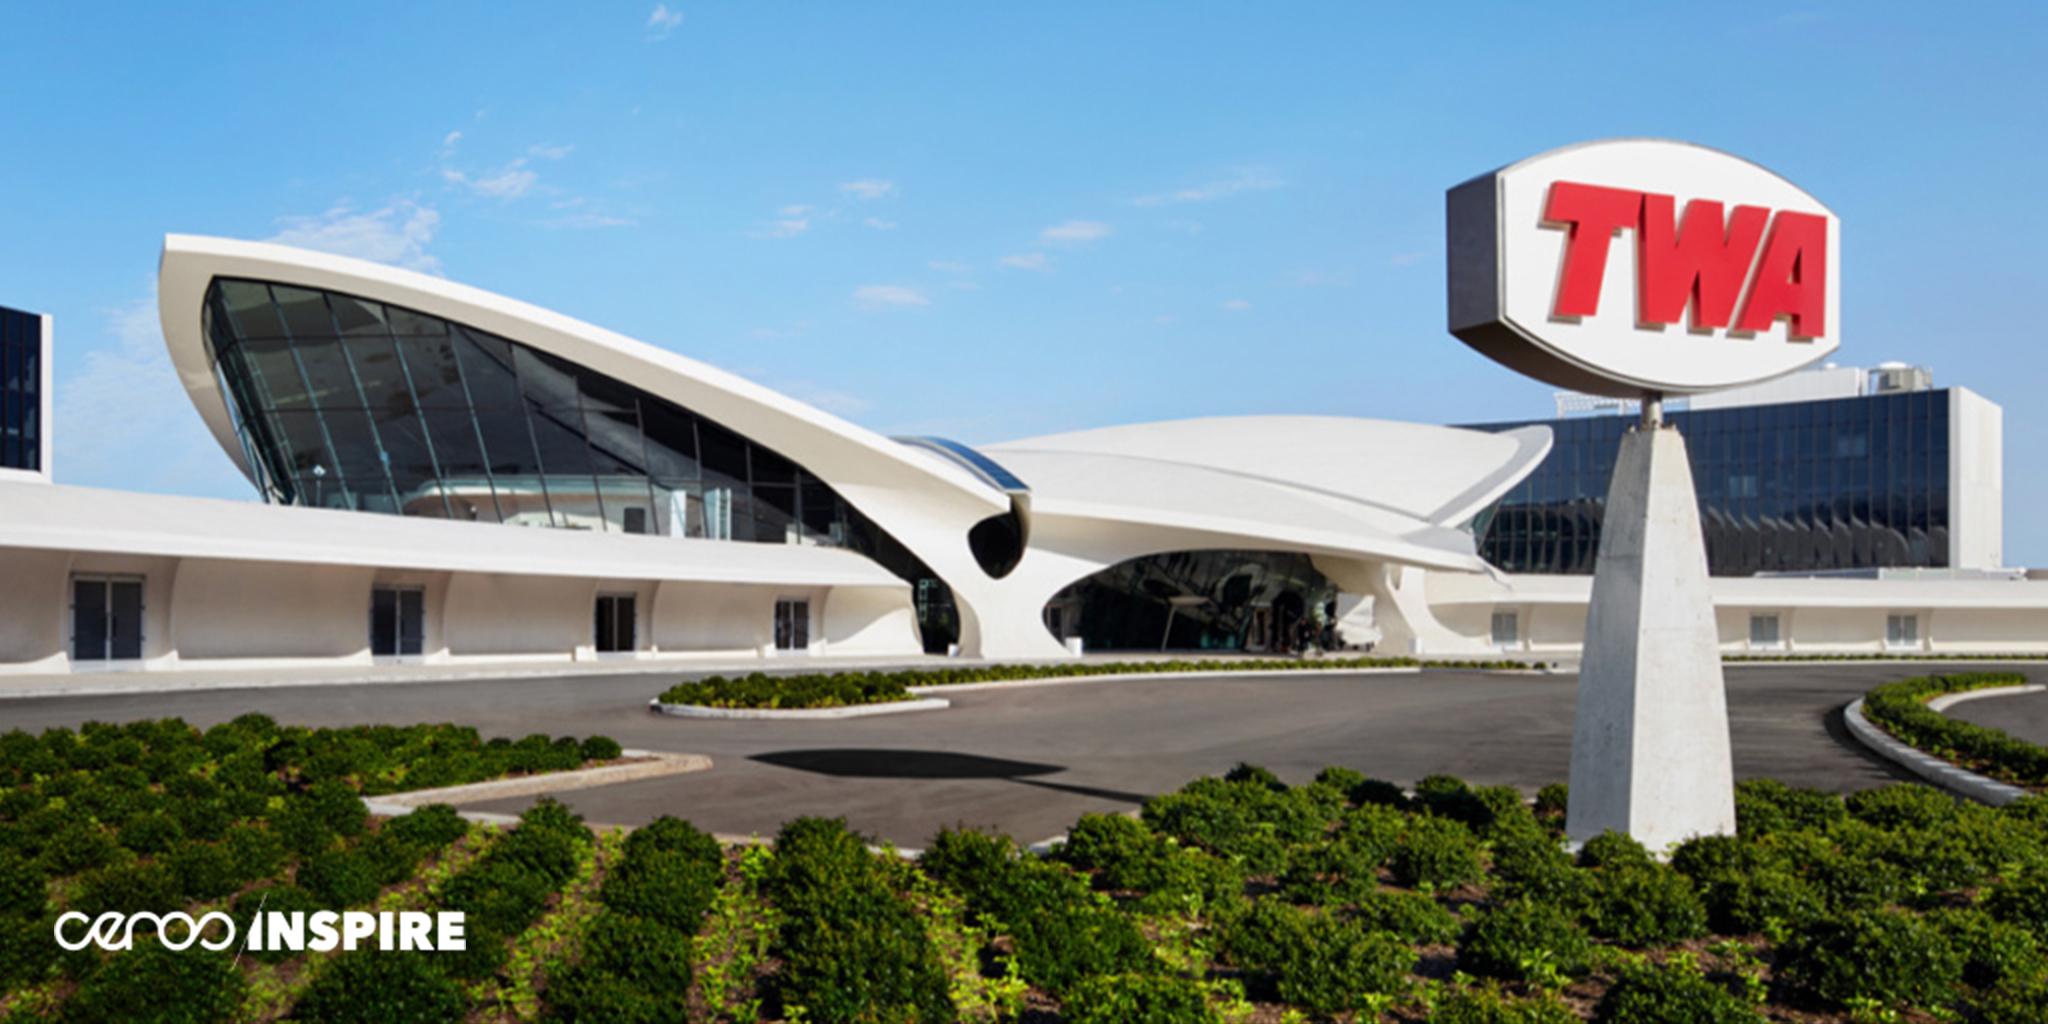 TWA Terminal at New York's John F Kennedy Airport